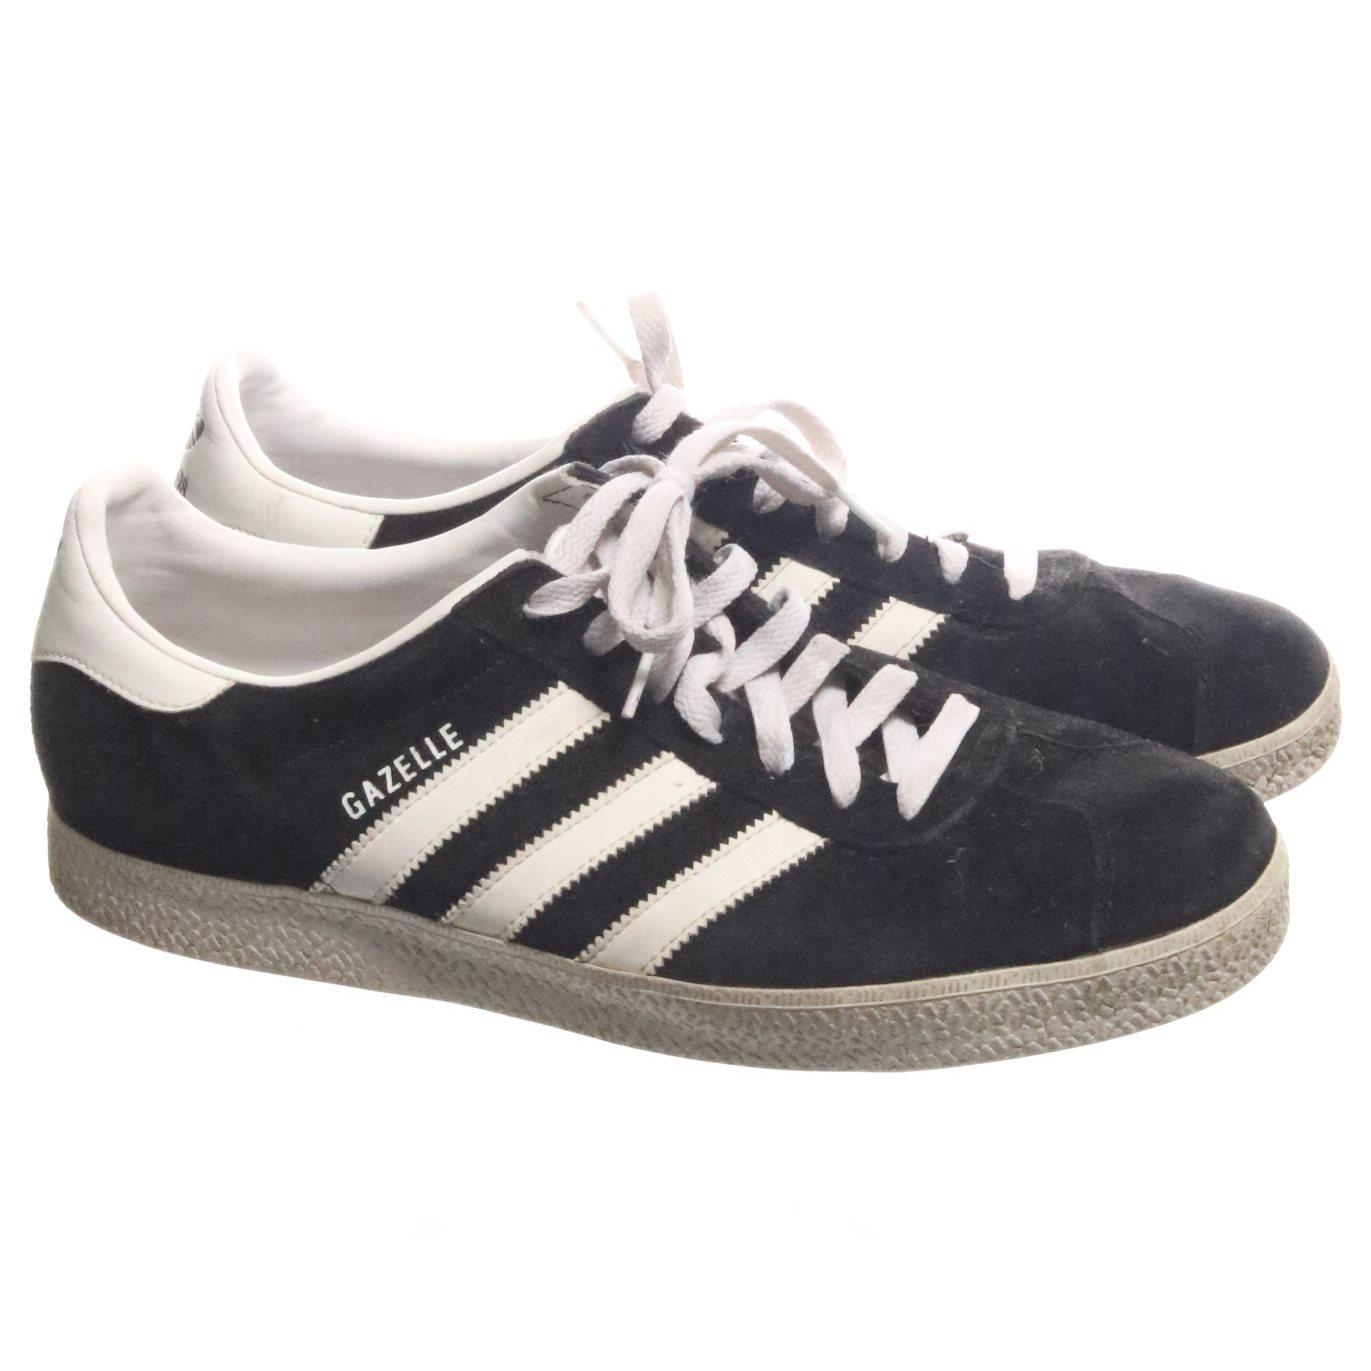 separation shoes 93ce1 f6df6 Adidas, Sneakers, Strl 44, Gazelle, SvartVit, Mocka